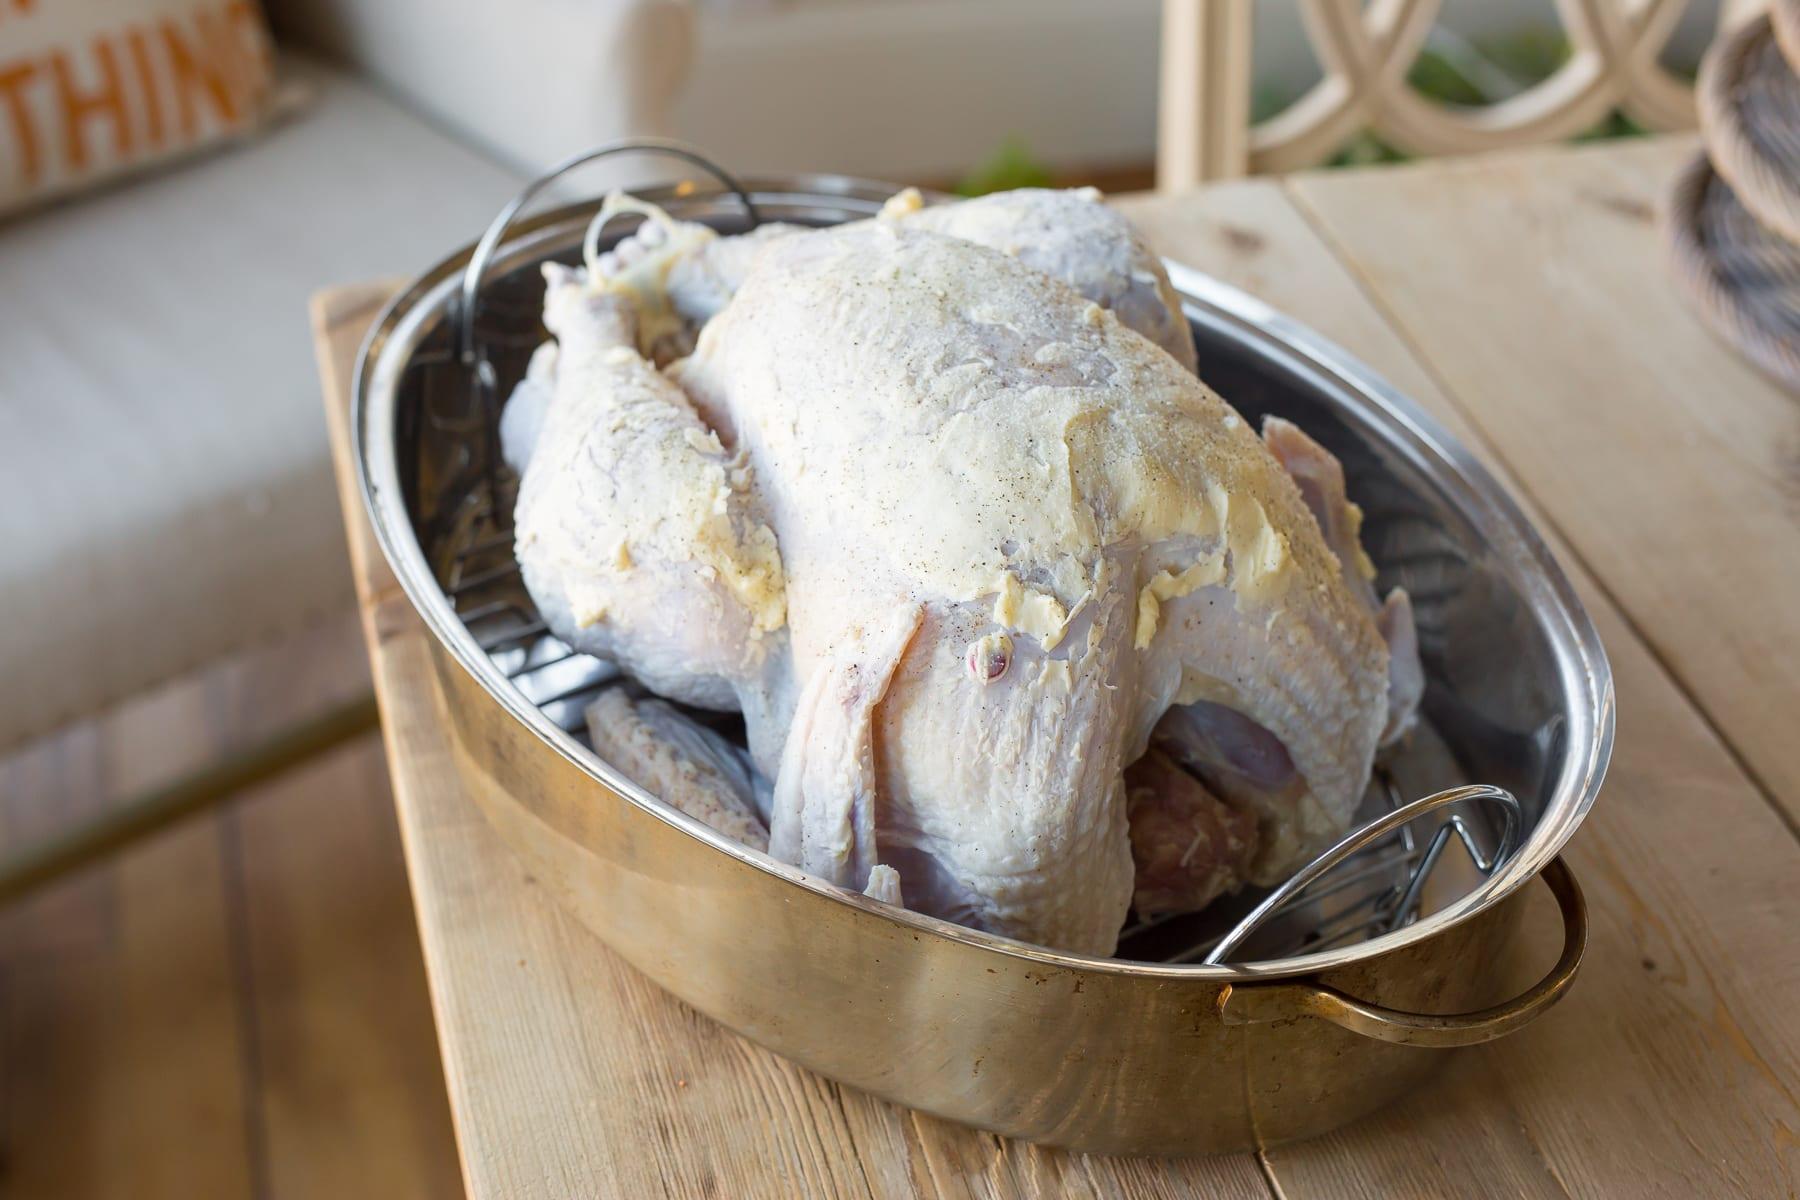 turkey brine thanksgiving turkey recipe brine recipe holiday cooking roasting roasted turkey thanksgiving recipes